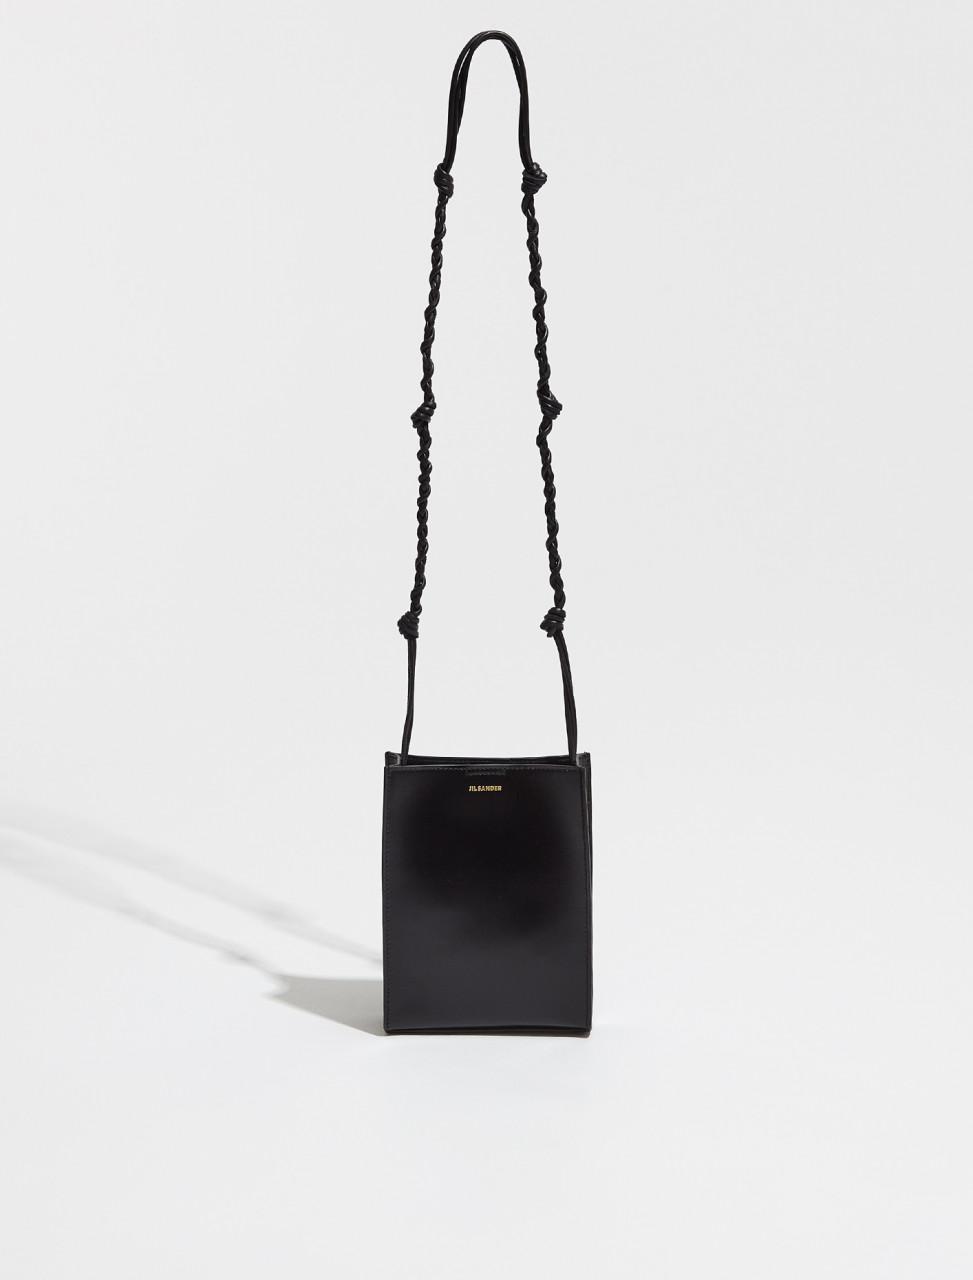 JSPT853173_WTB69158N_001 JIL SANDER TANGLE SMALL BAG IN BLACK